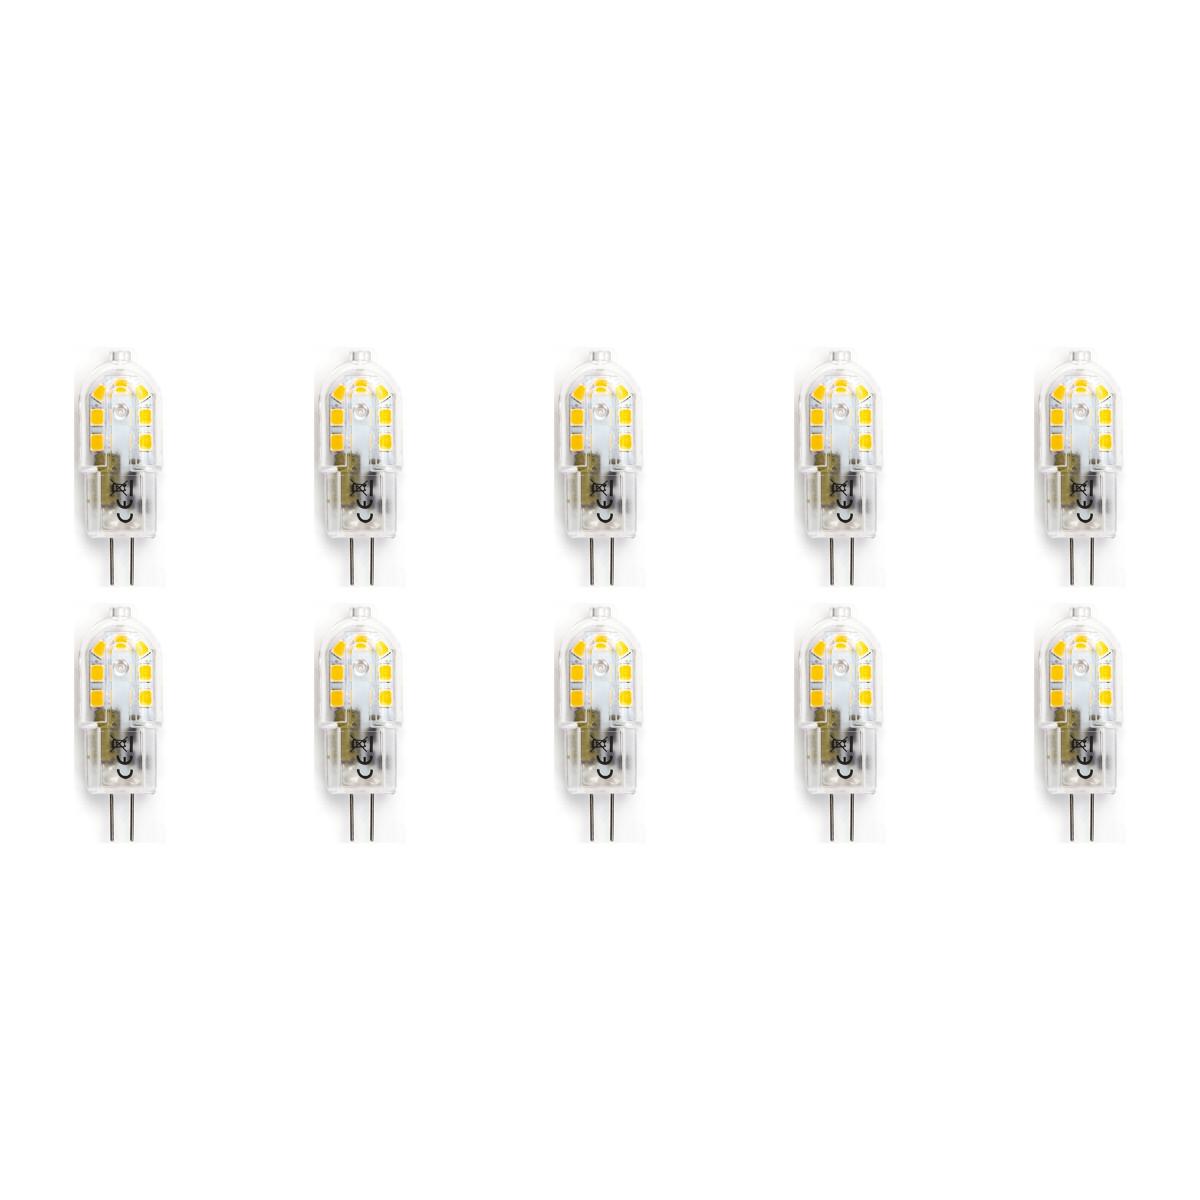 LED Lamp 10 Pack - Aigi - G4 Fitting - 2W - Helder/Koud Wit 6500K   Vervangt 20W